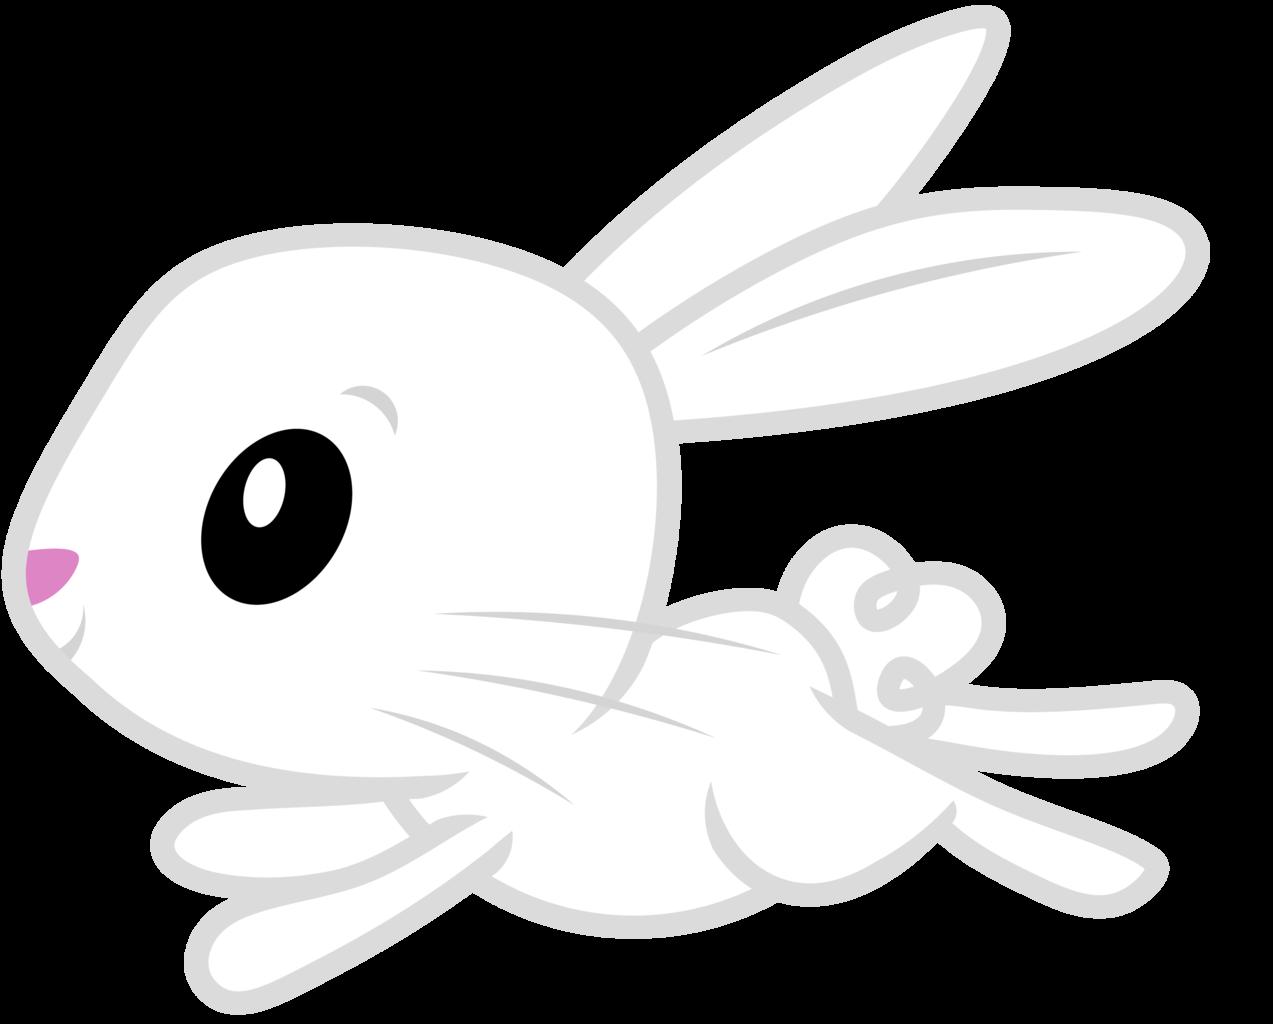 angel artist axemgr. Clipart bunny poop